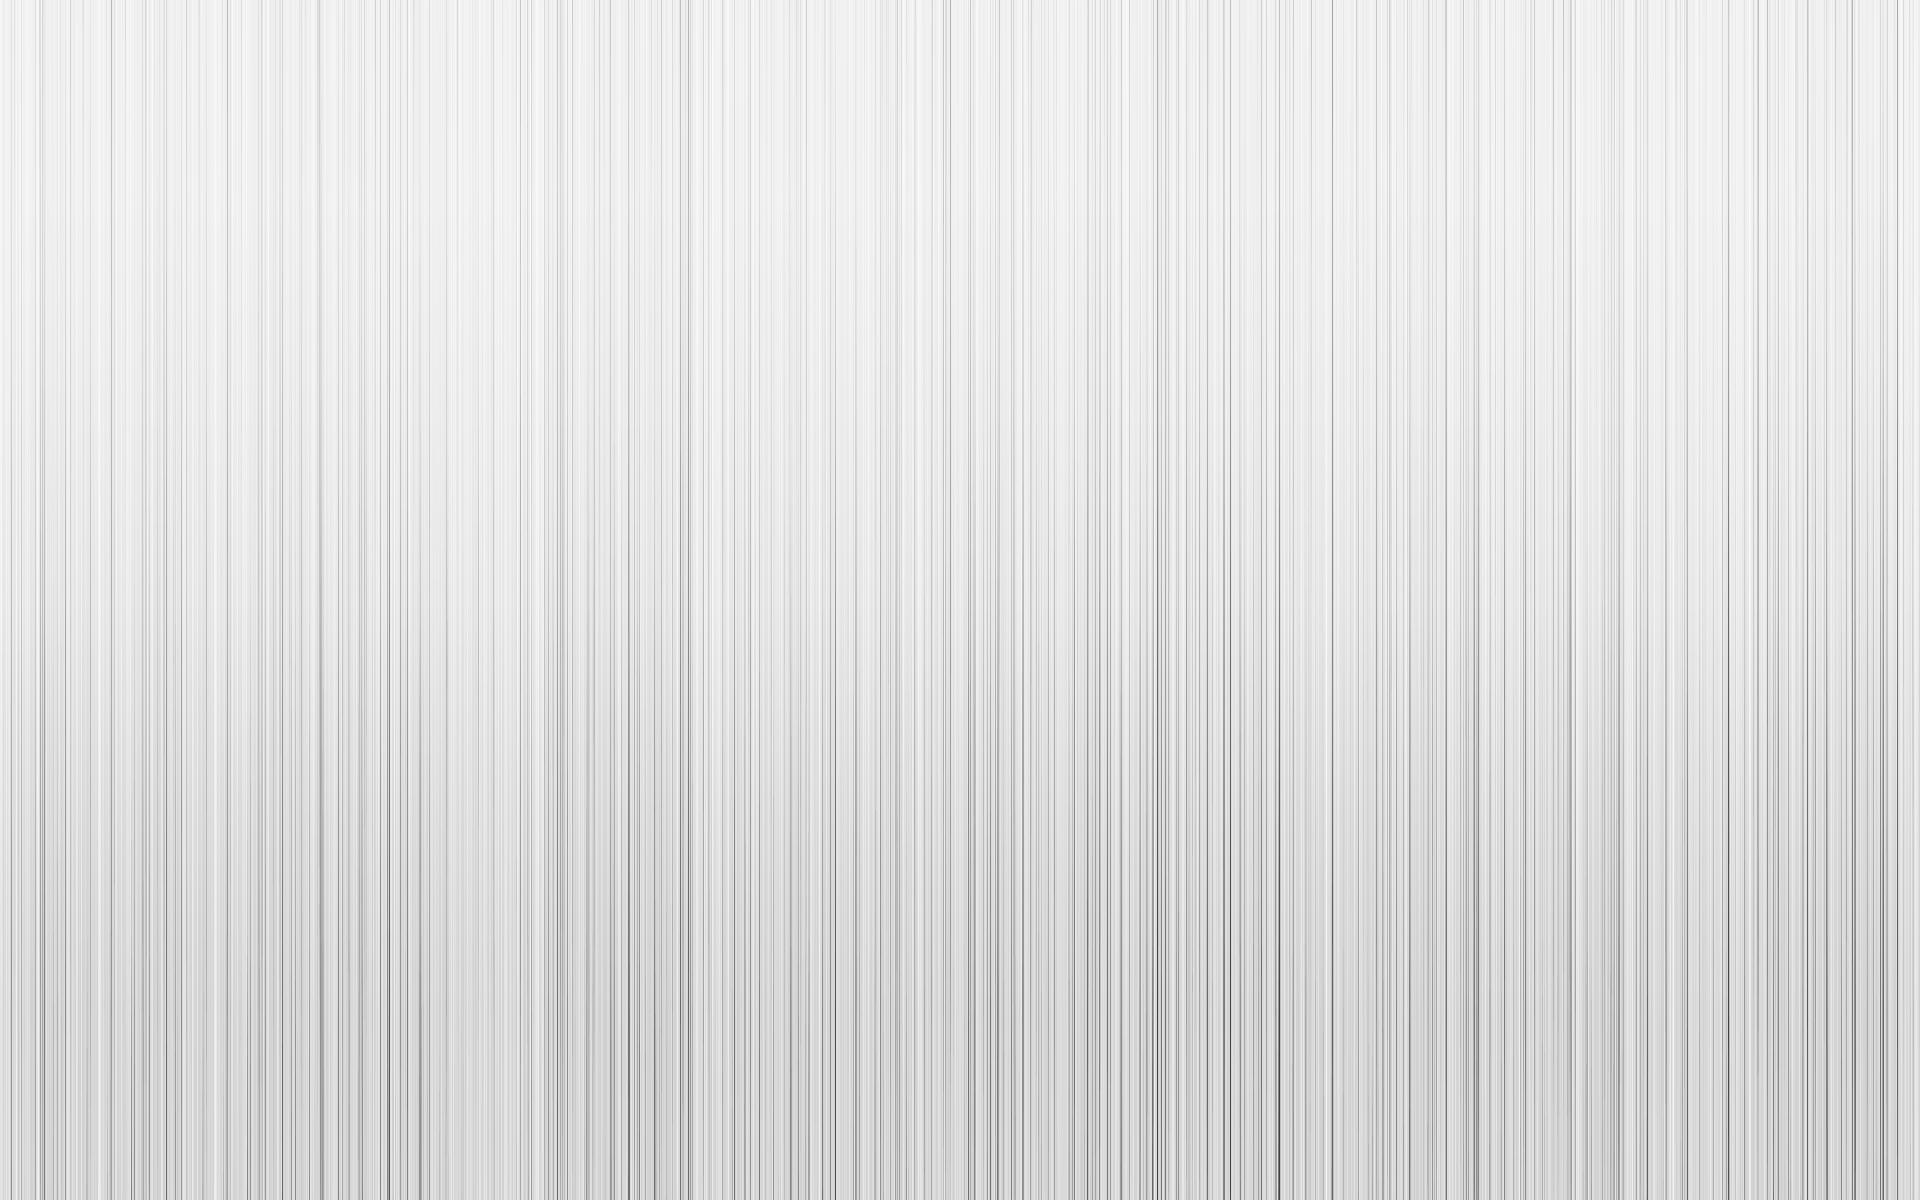 Grey wallpaper hd download free grey background 4season for Home 2015 wallpaper hd